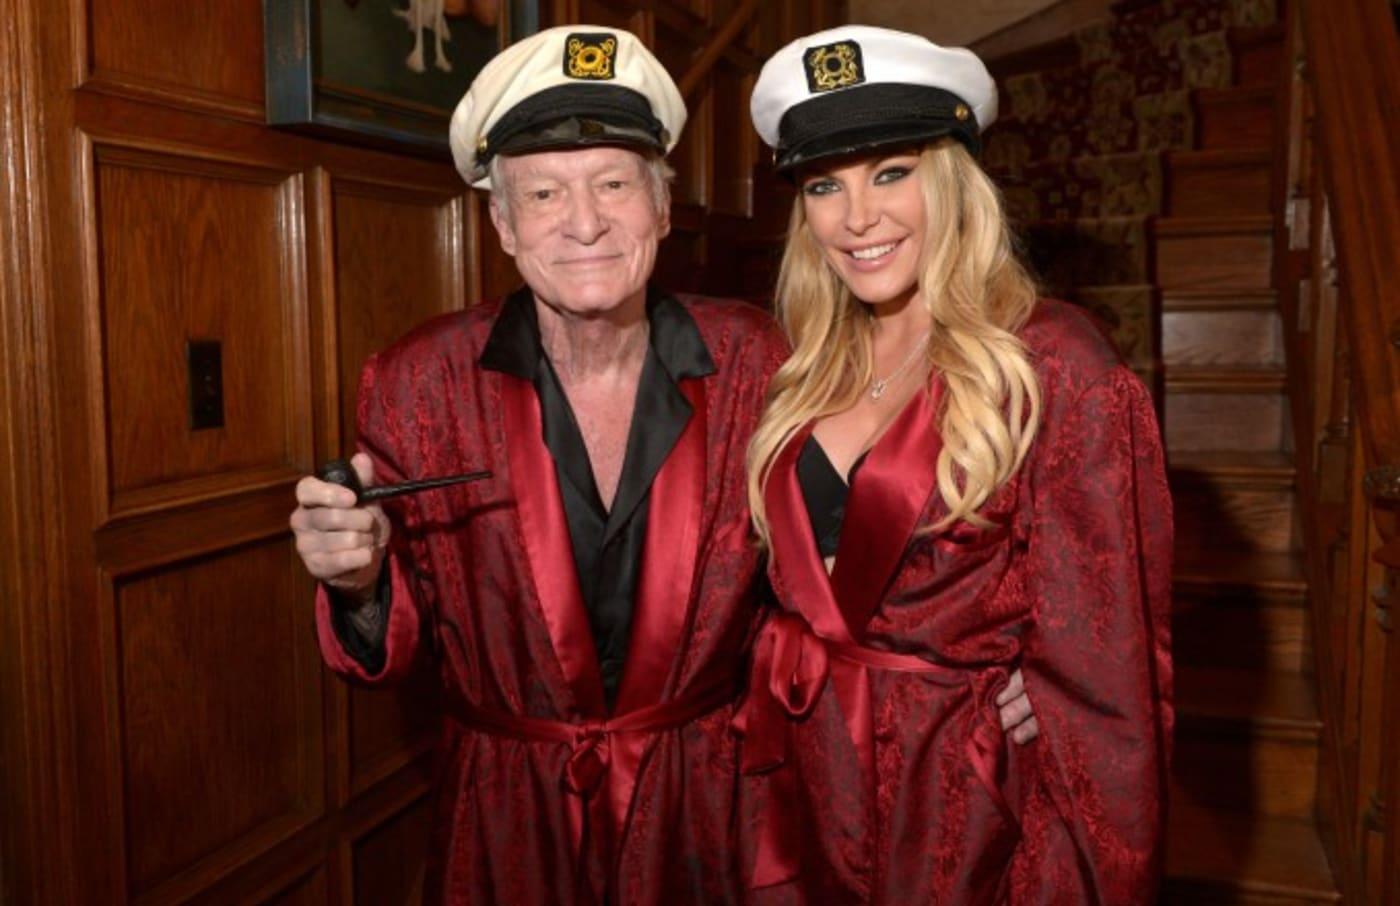 Hugh Hefner with his wife Crystal.